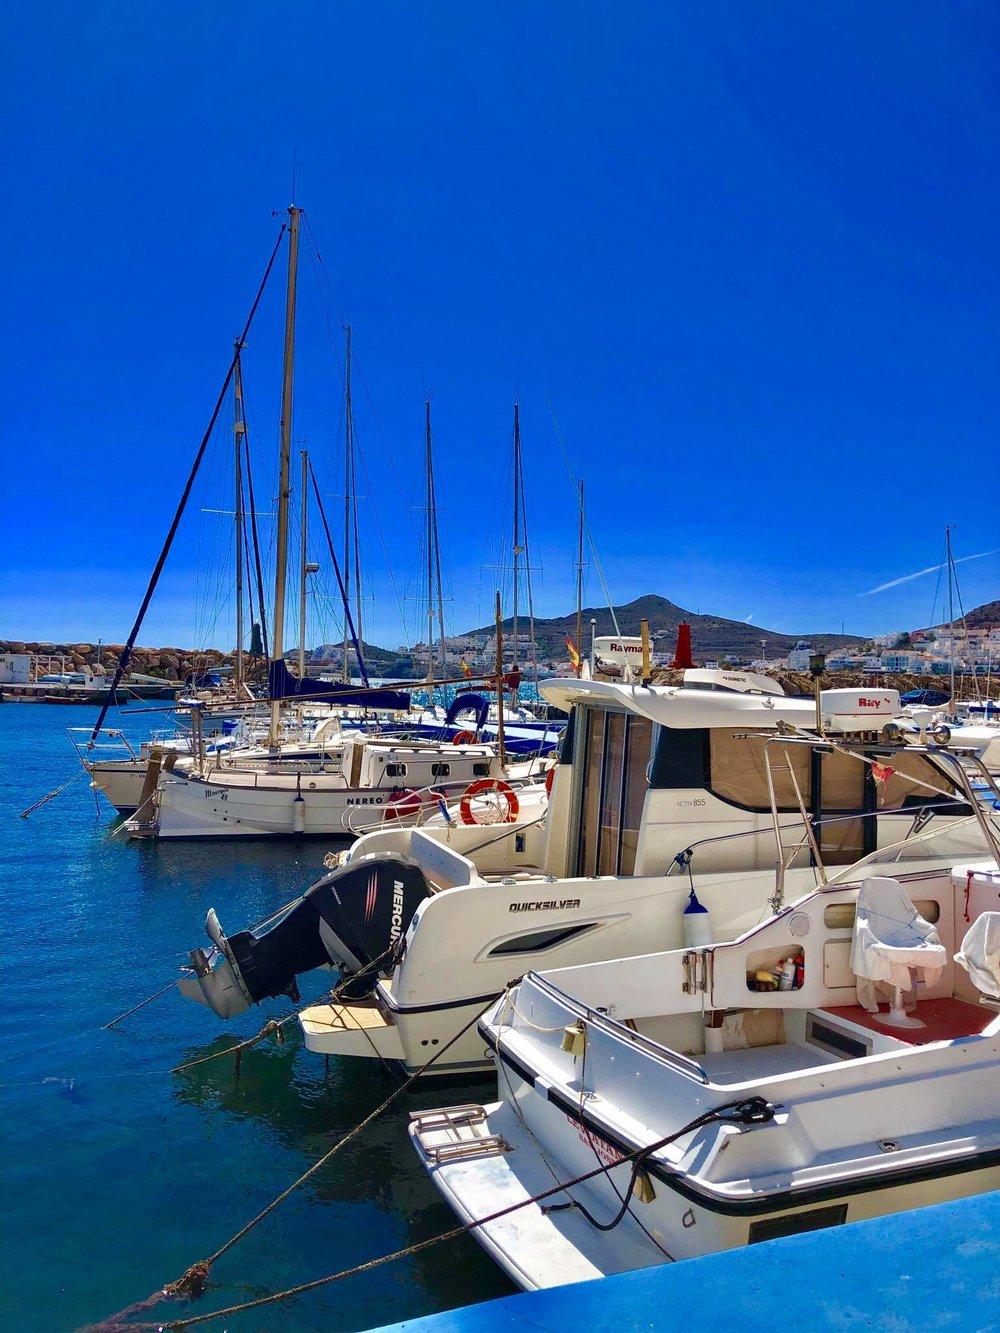 Kach Solo Travels in 2019 Spain you're so beautiful18.jpg